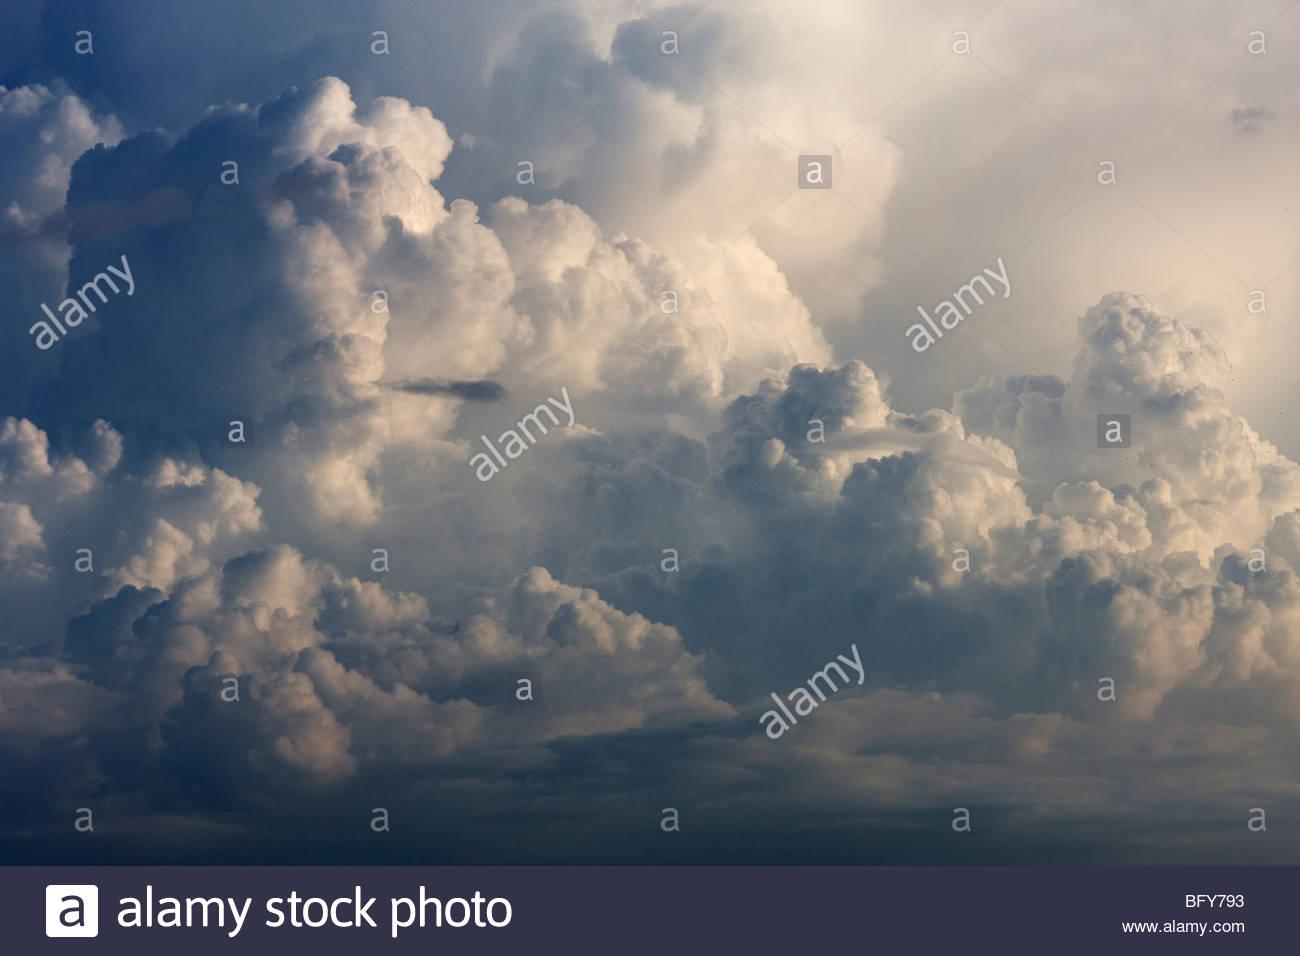 A towering cumulonimbus cloud forms over the Pacific Ocean near Sayulita, Mexico. - Stock Image